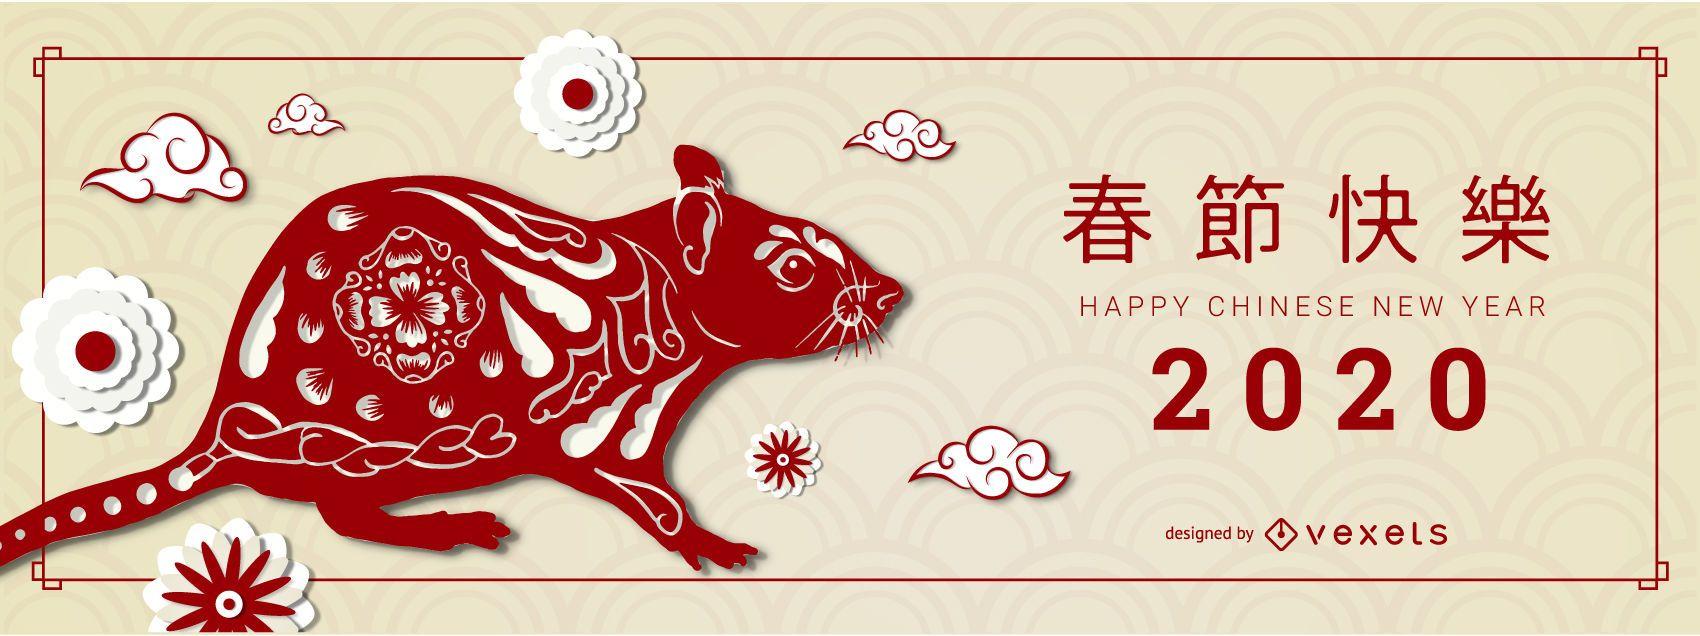 Chinese new year 2020 rat banner